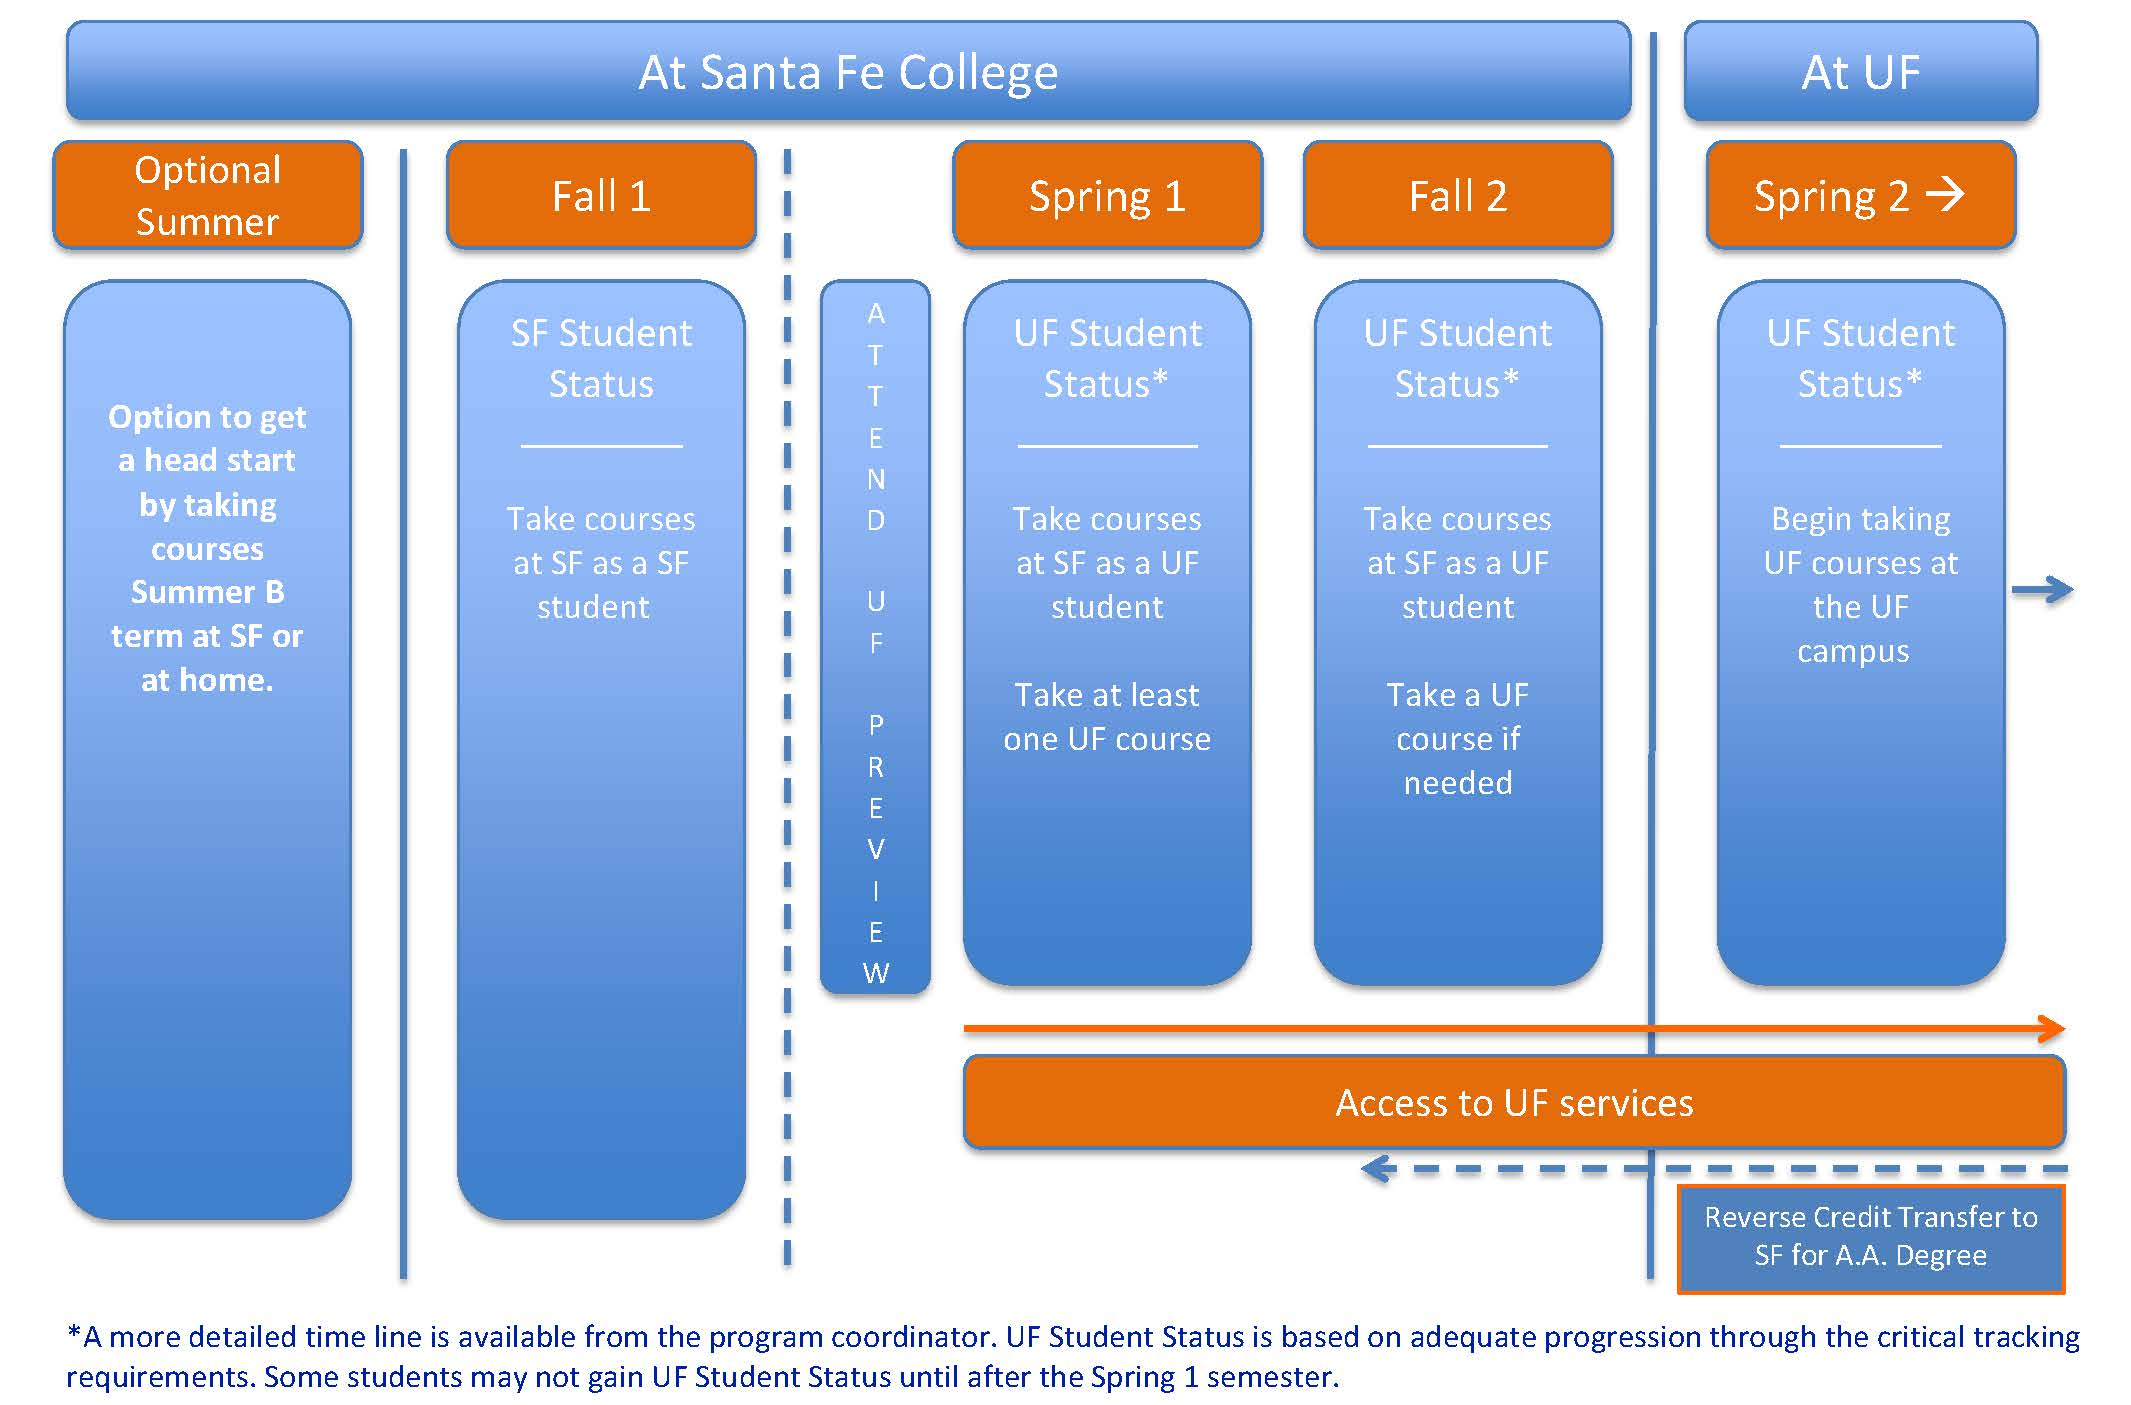 Uf Calendar 2021 Program Dates and Timeline   Undergraduate Student Affairs